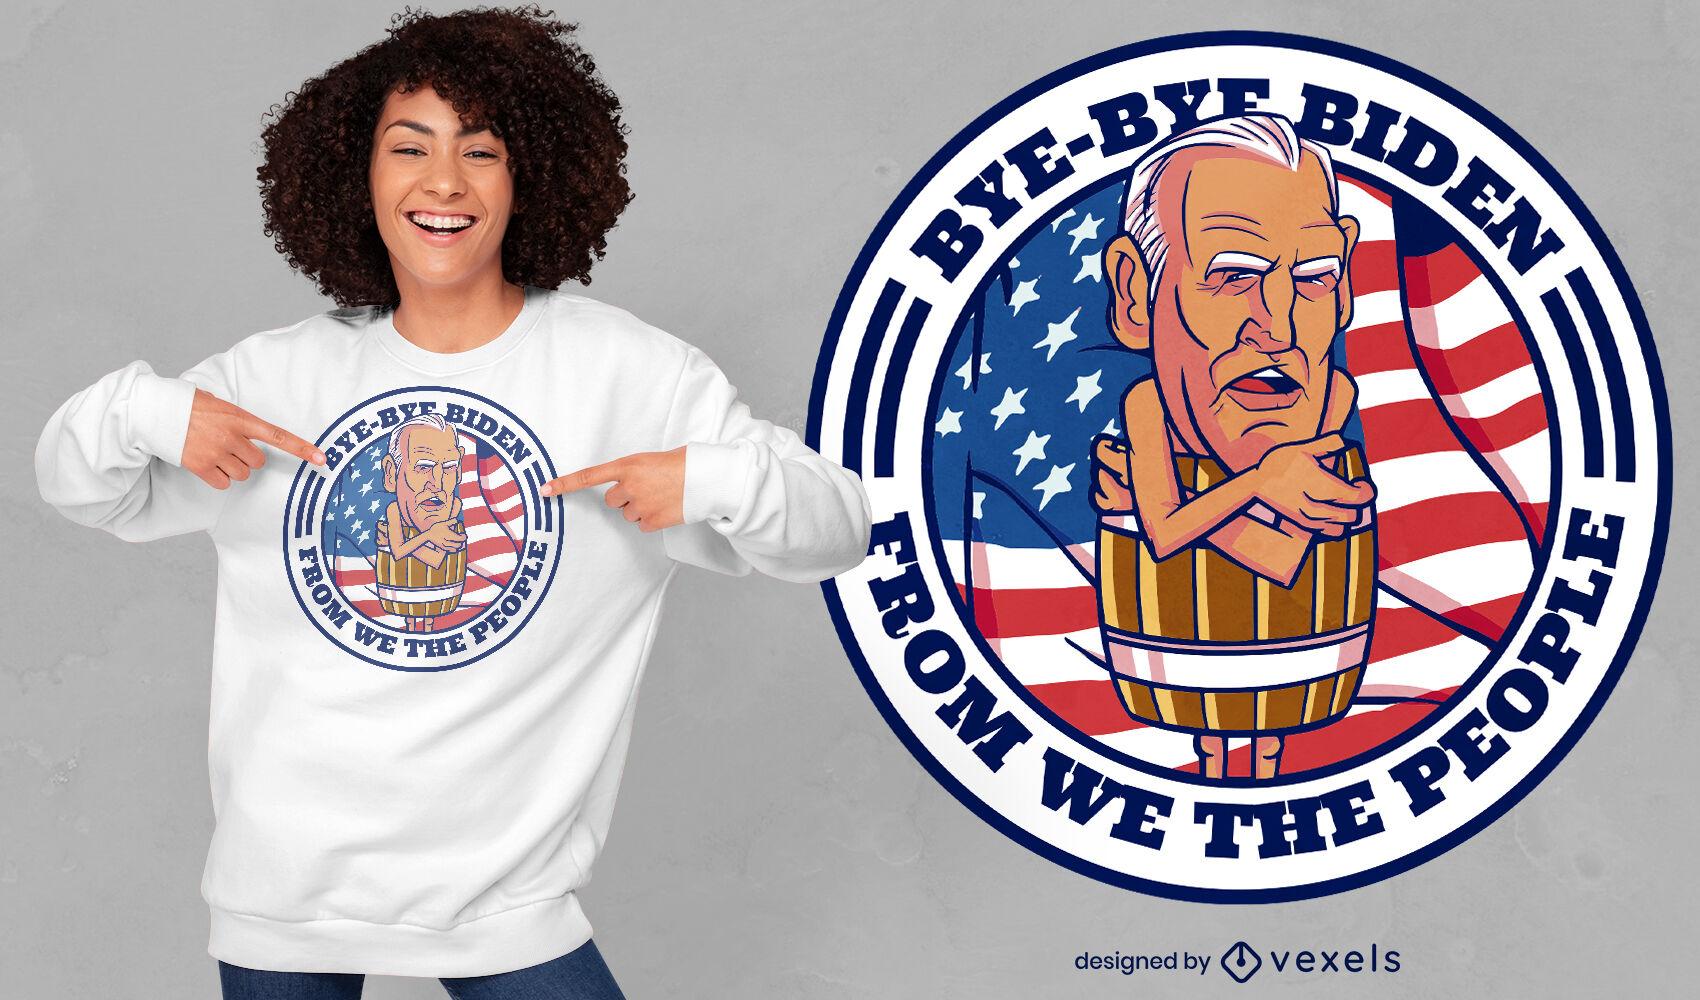 Biden cartoon parody funny t-shirt design